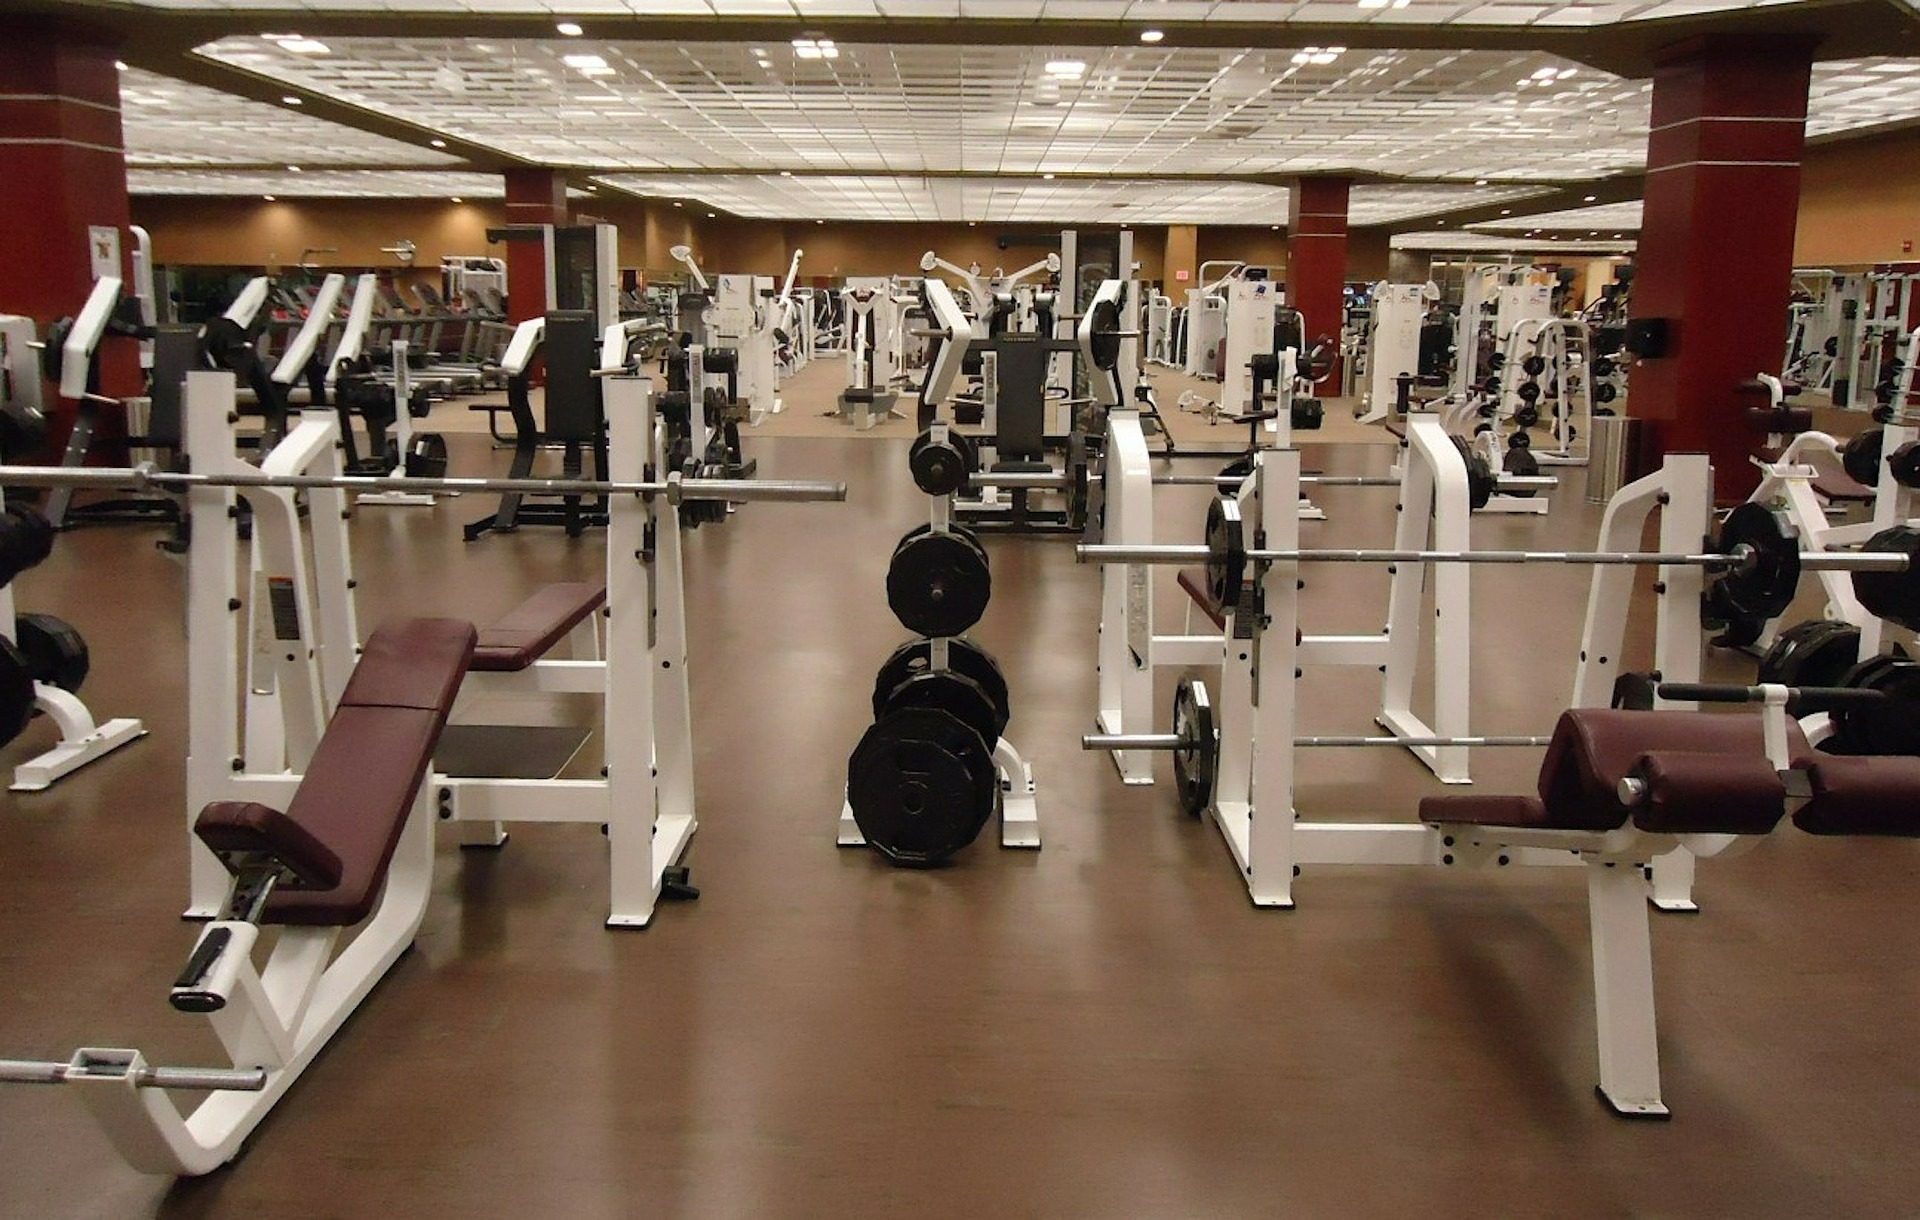 weightroommachines-91849_1920.jpg